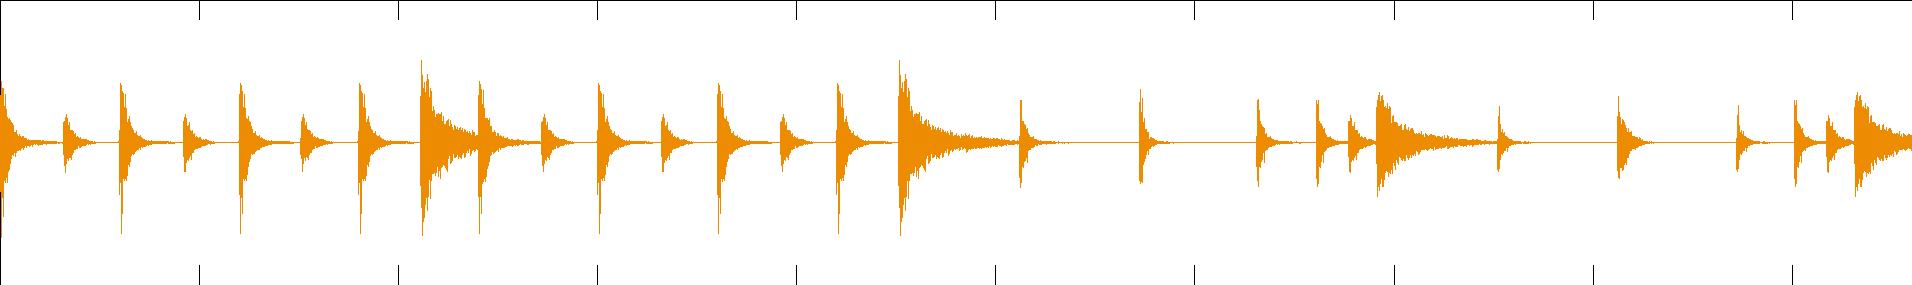 WaveDrum02_58_HH